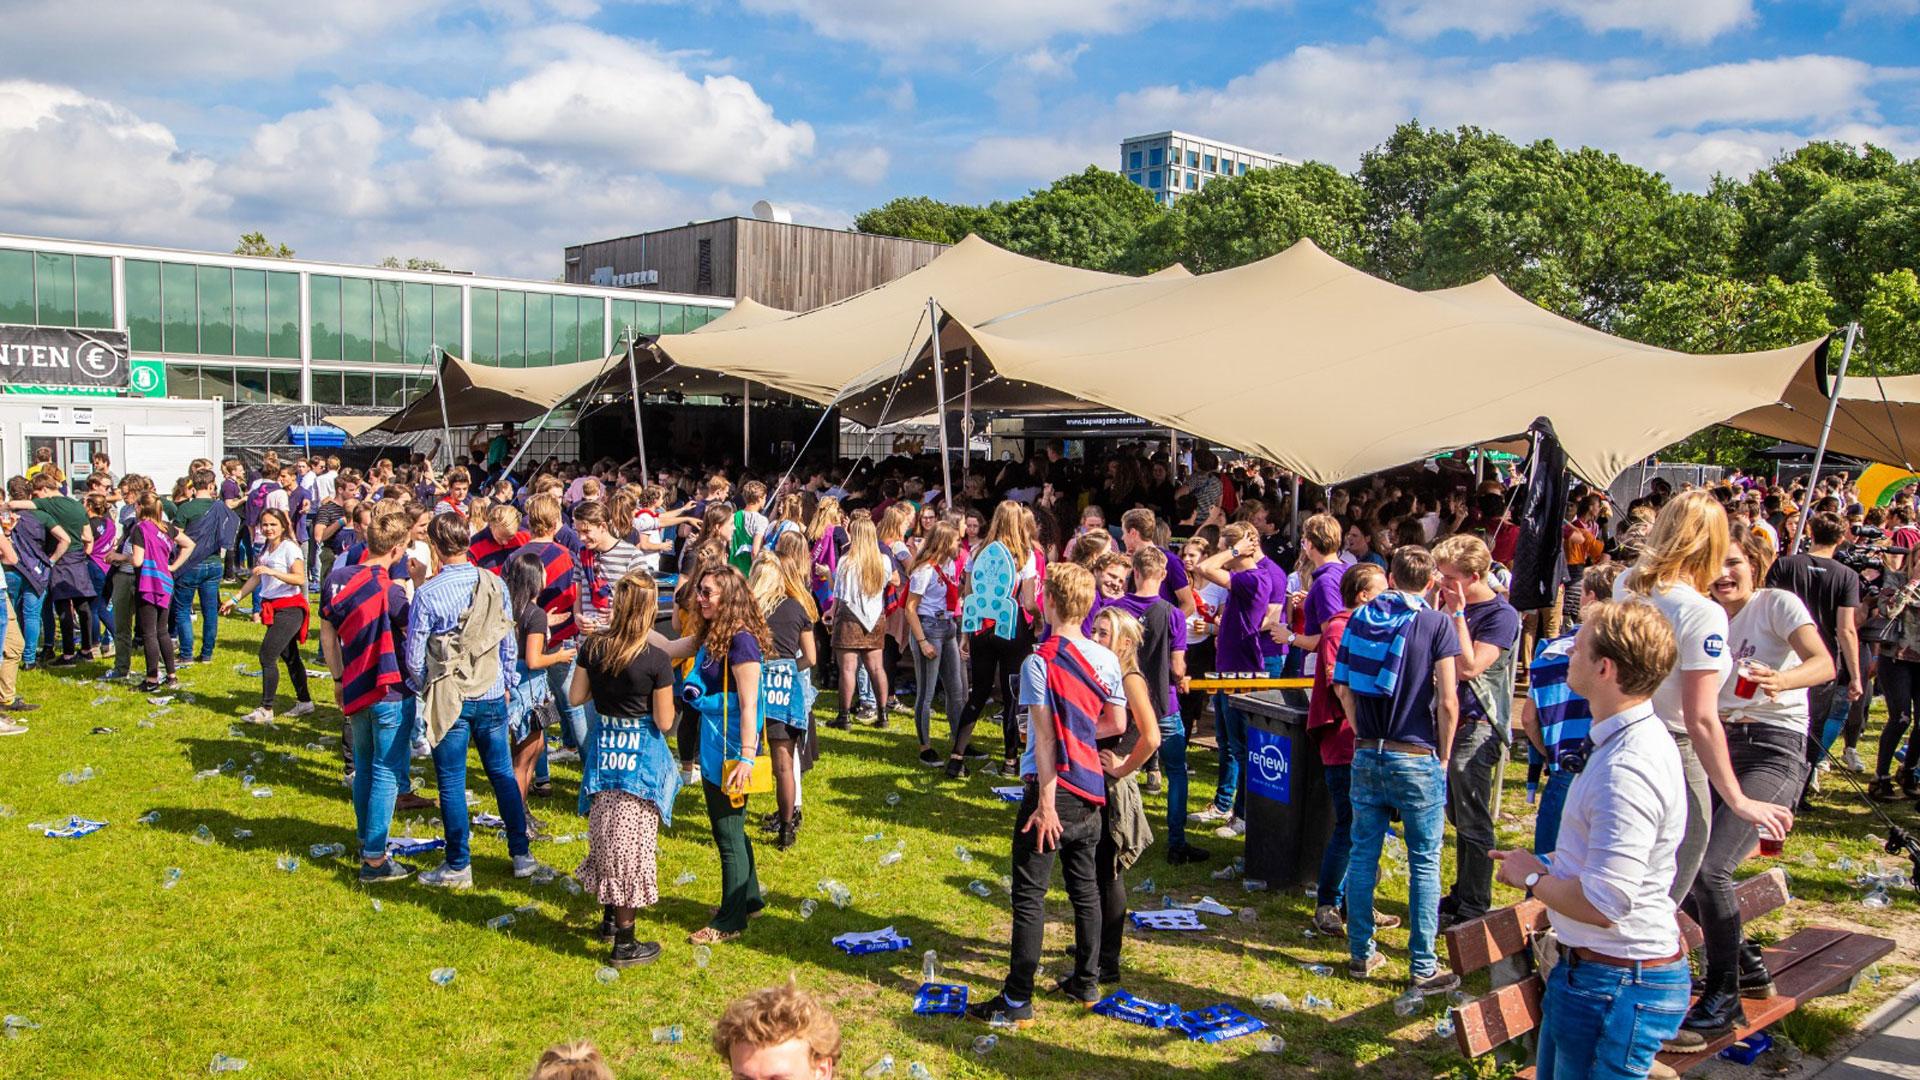 alphatentevent-festival-ultrasonic-festival-dj-place-maarssenveenseplassen-flexten-5x75-meter-festivaltent-podiumtent